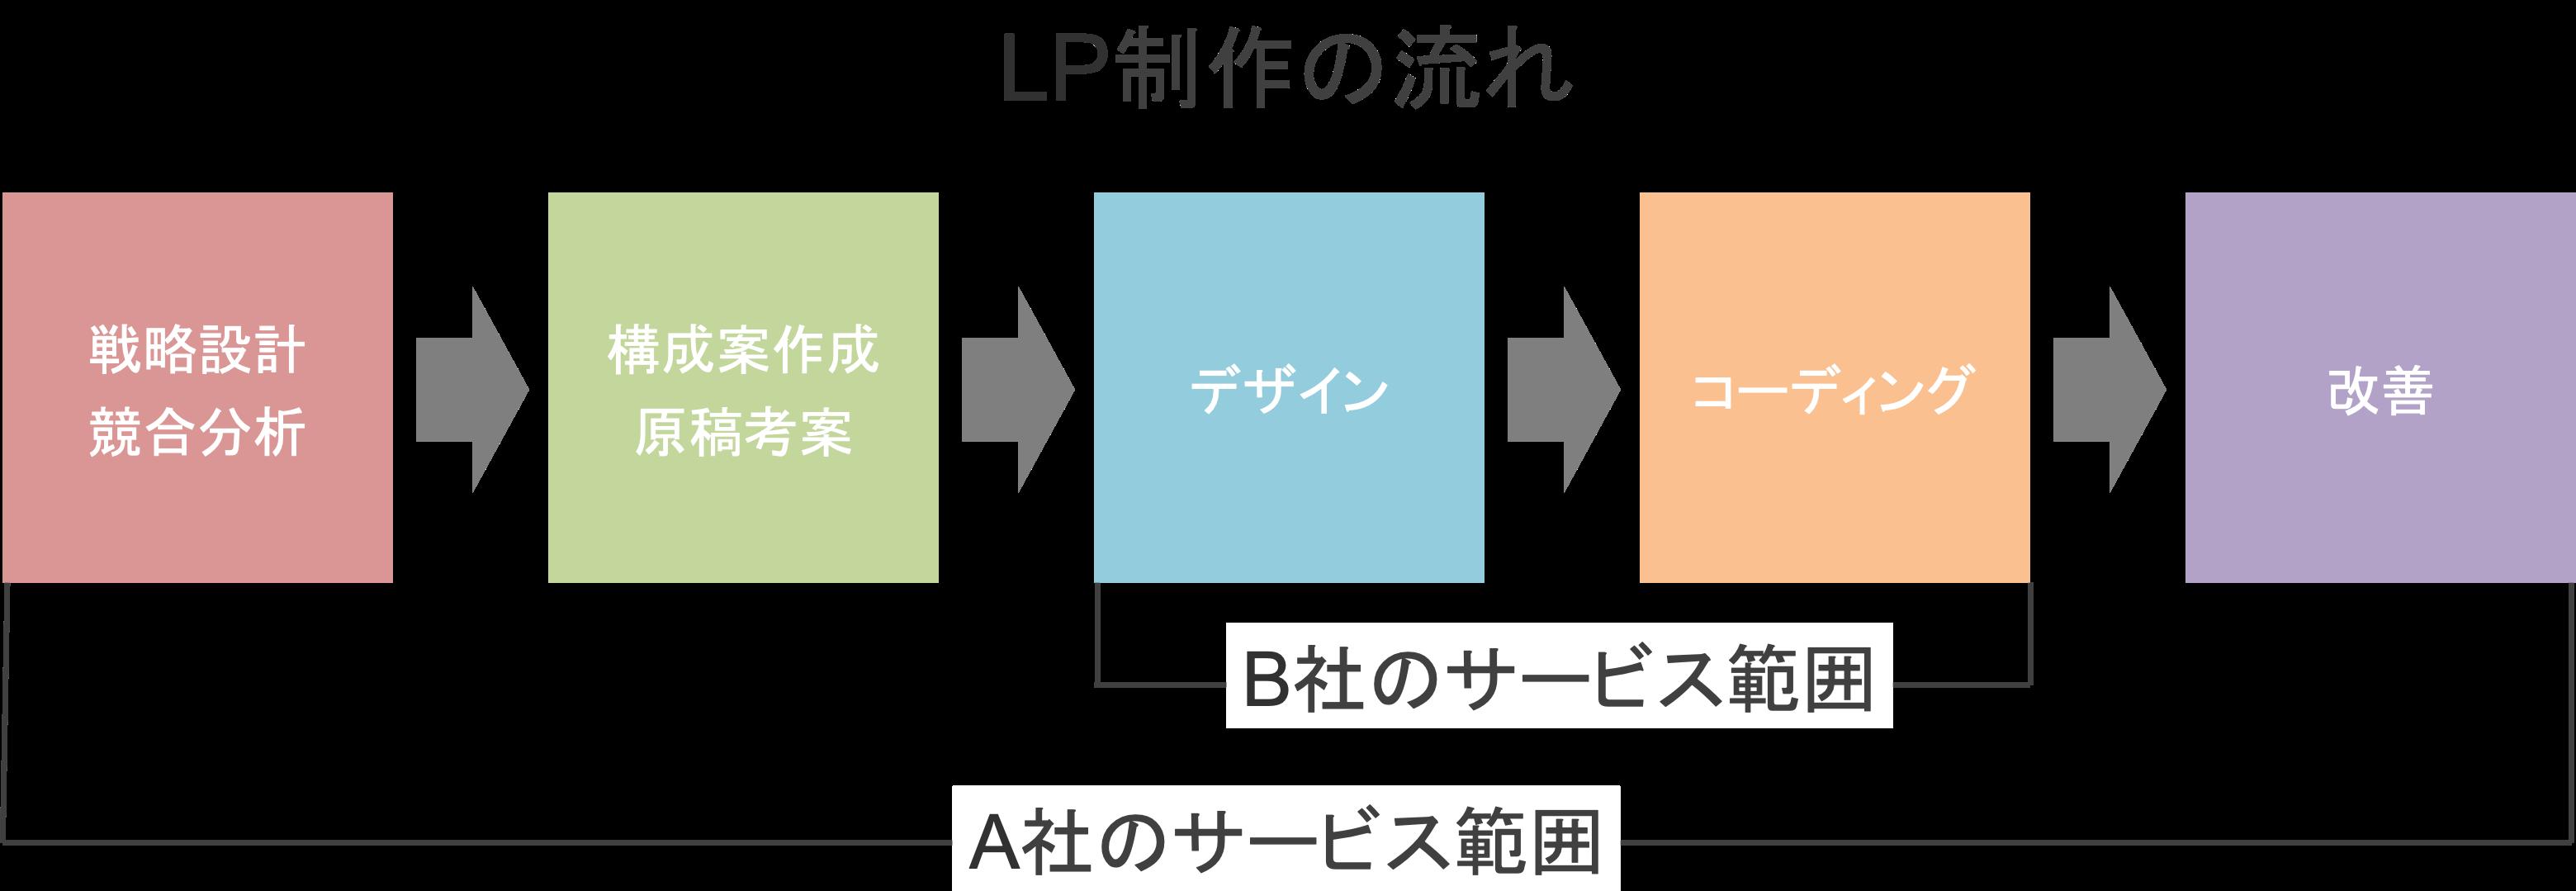 LP制作会社によってサービス範囲が違う具体例